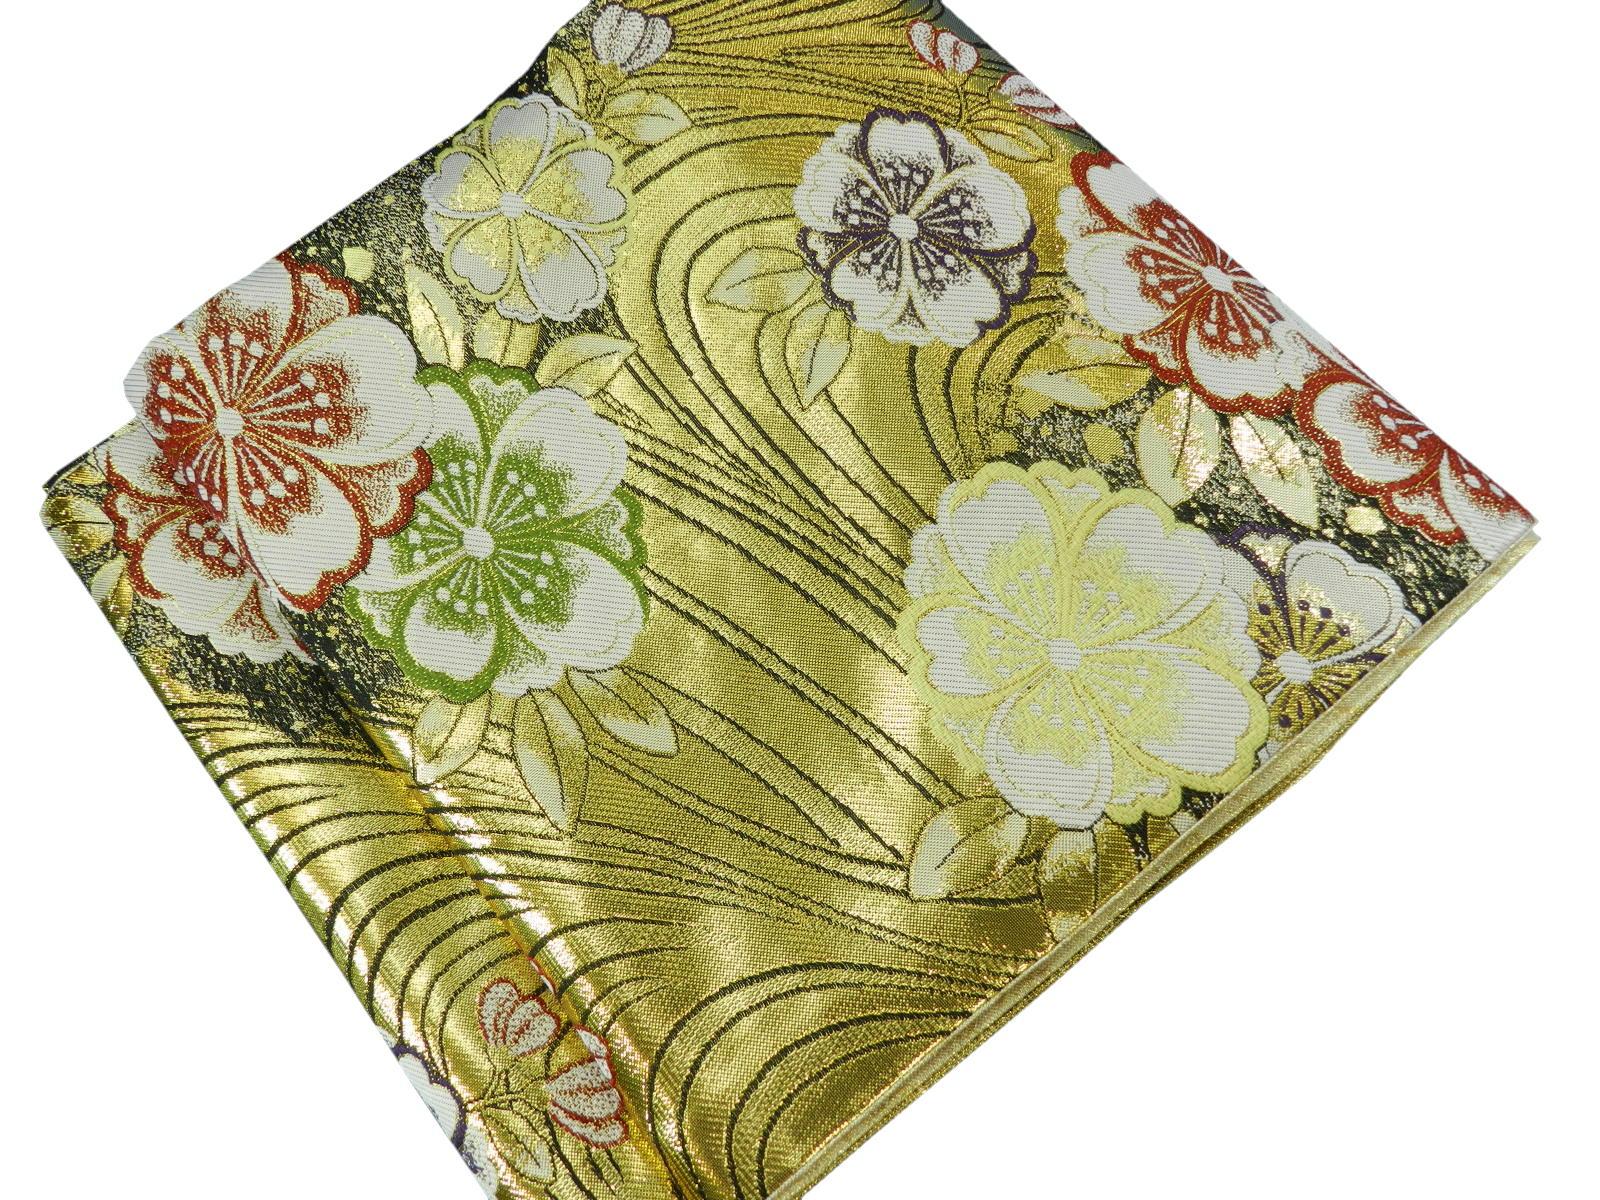 袋帯 正絹 西陣帯日本製 未仕立て振袖 訪問着にセール金額